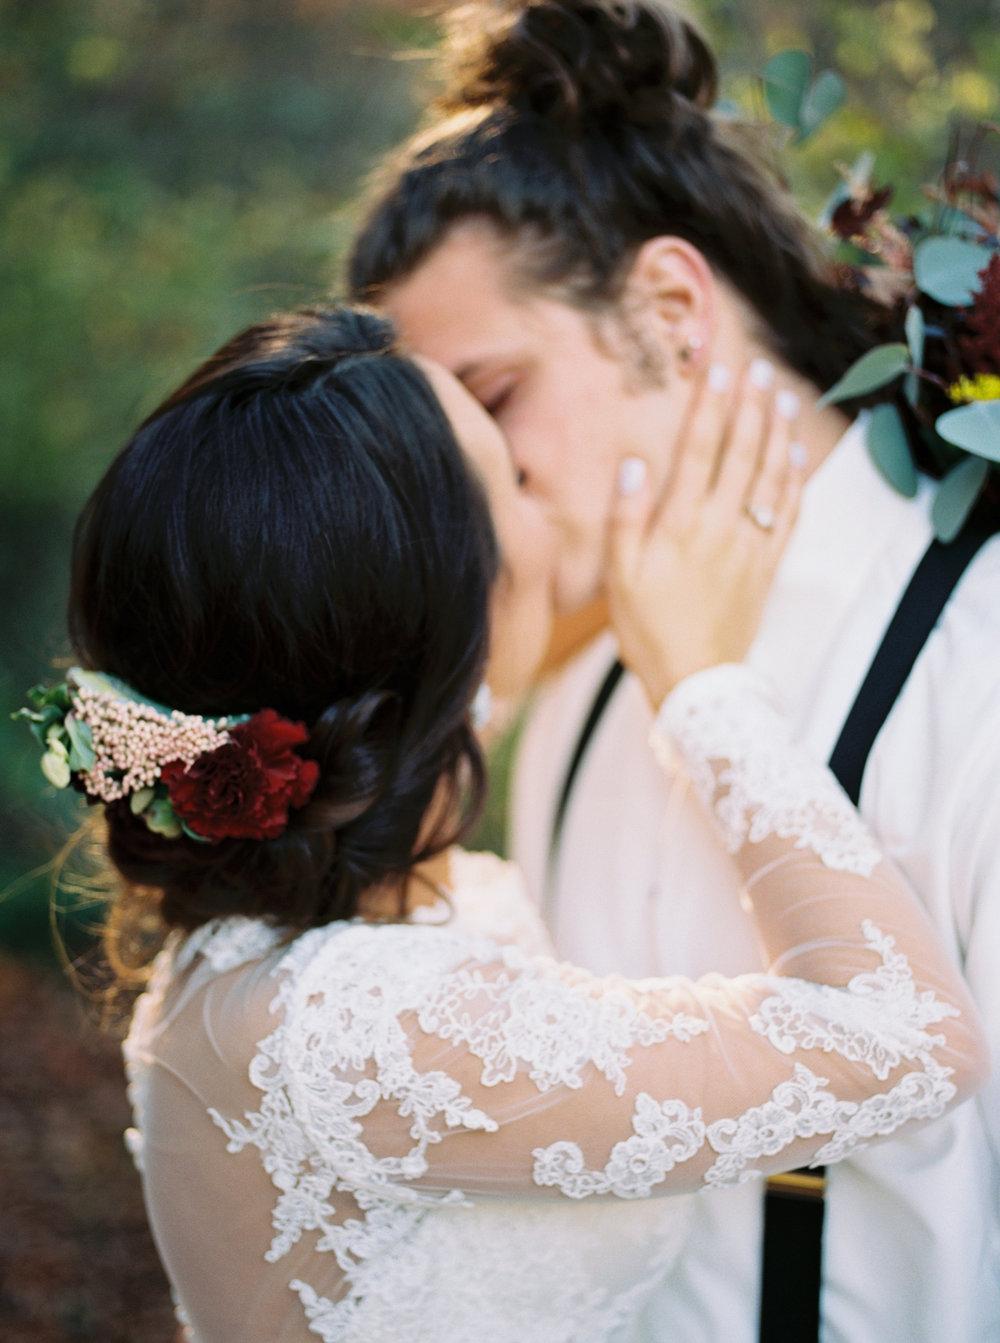 katie_Jordan_Daras_Garden_Wedding_Abigail_Malone_Photography-1142.jpg